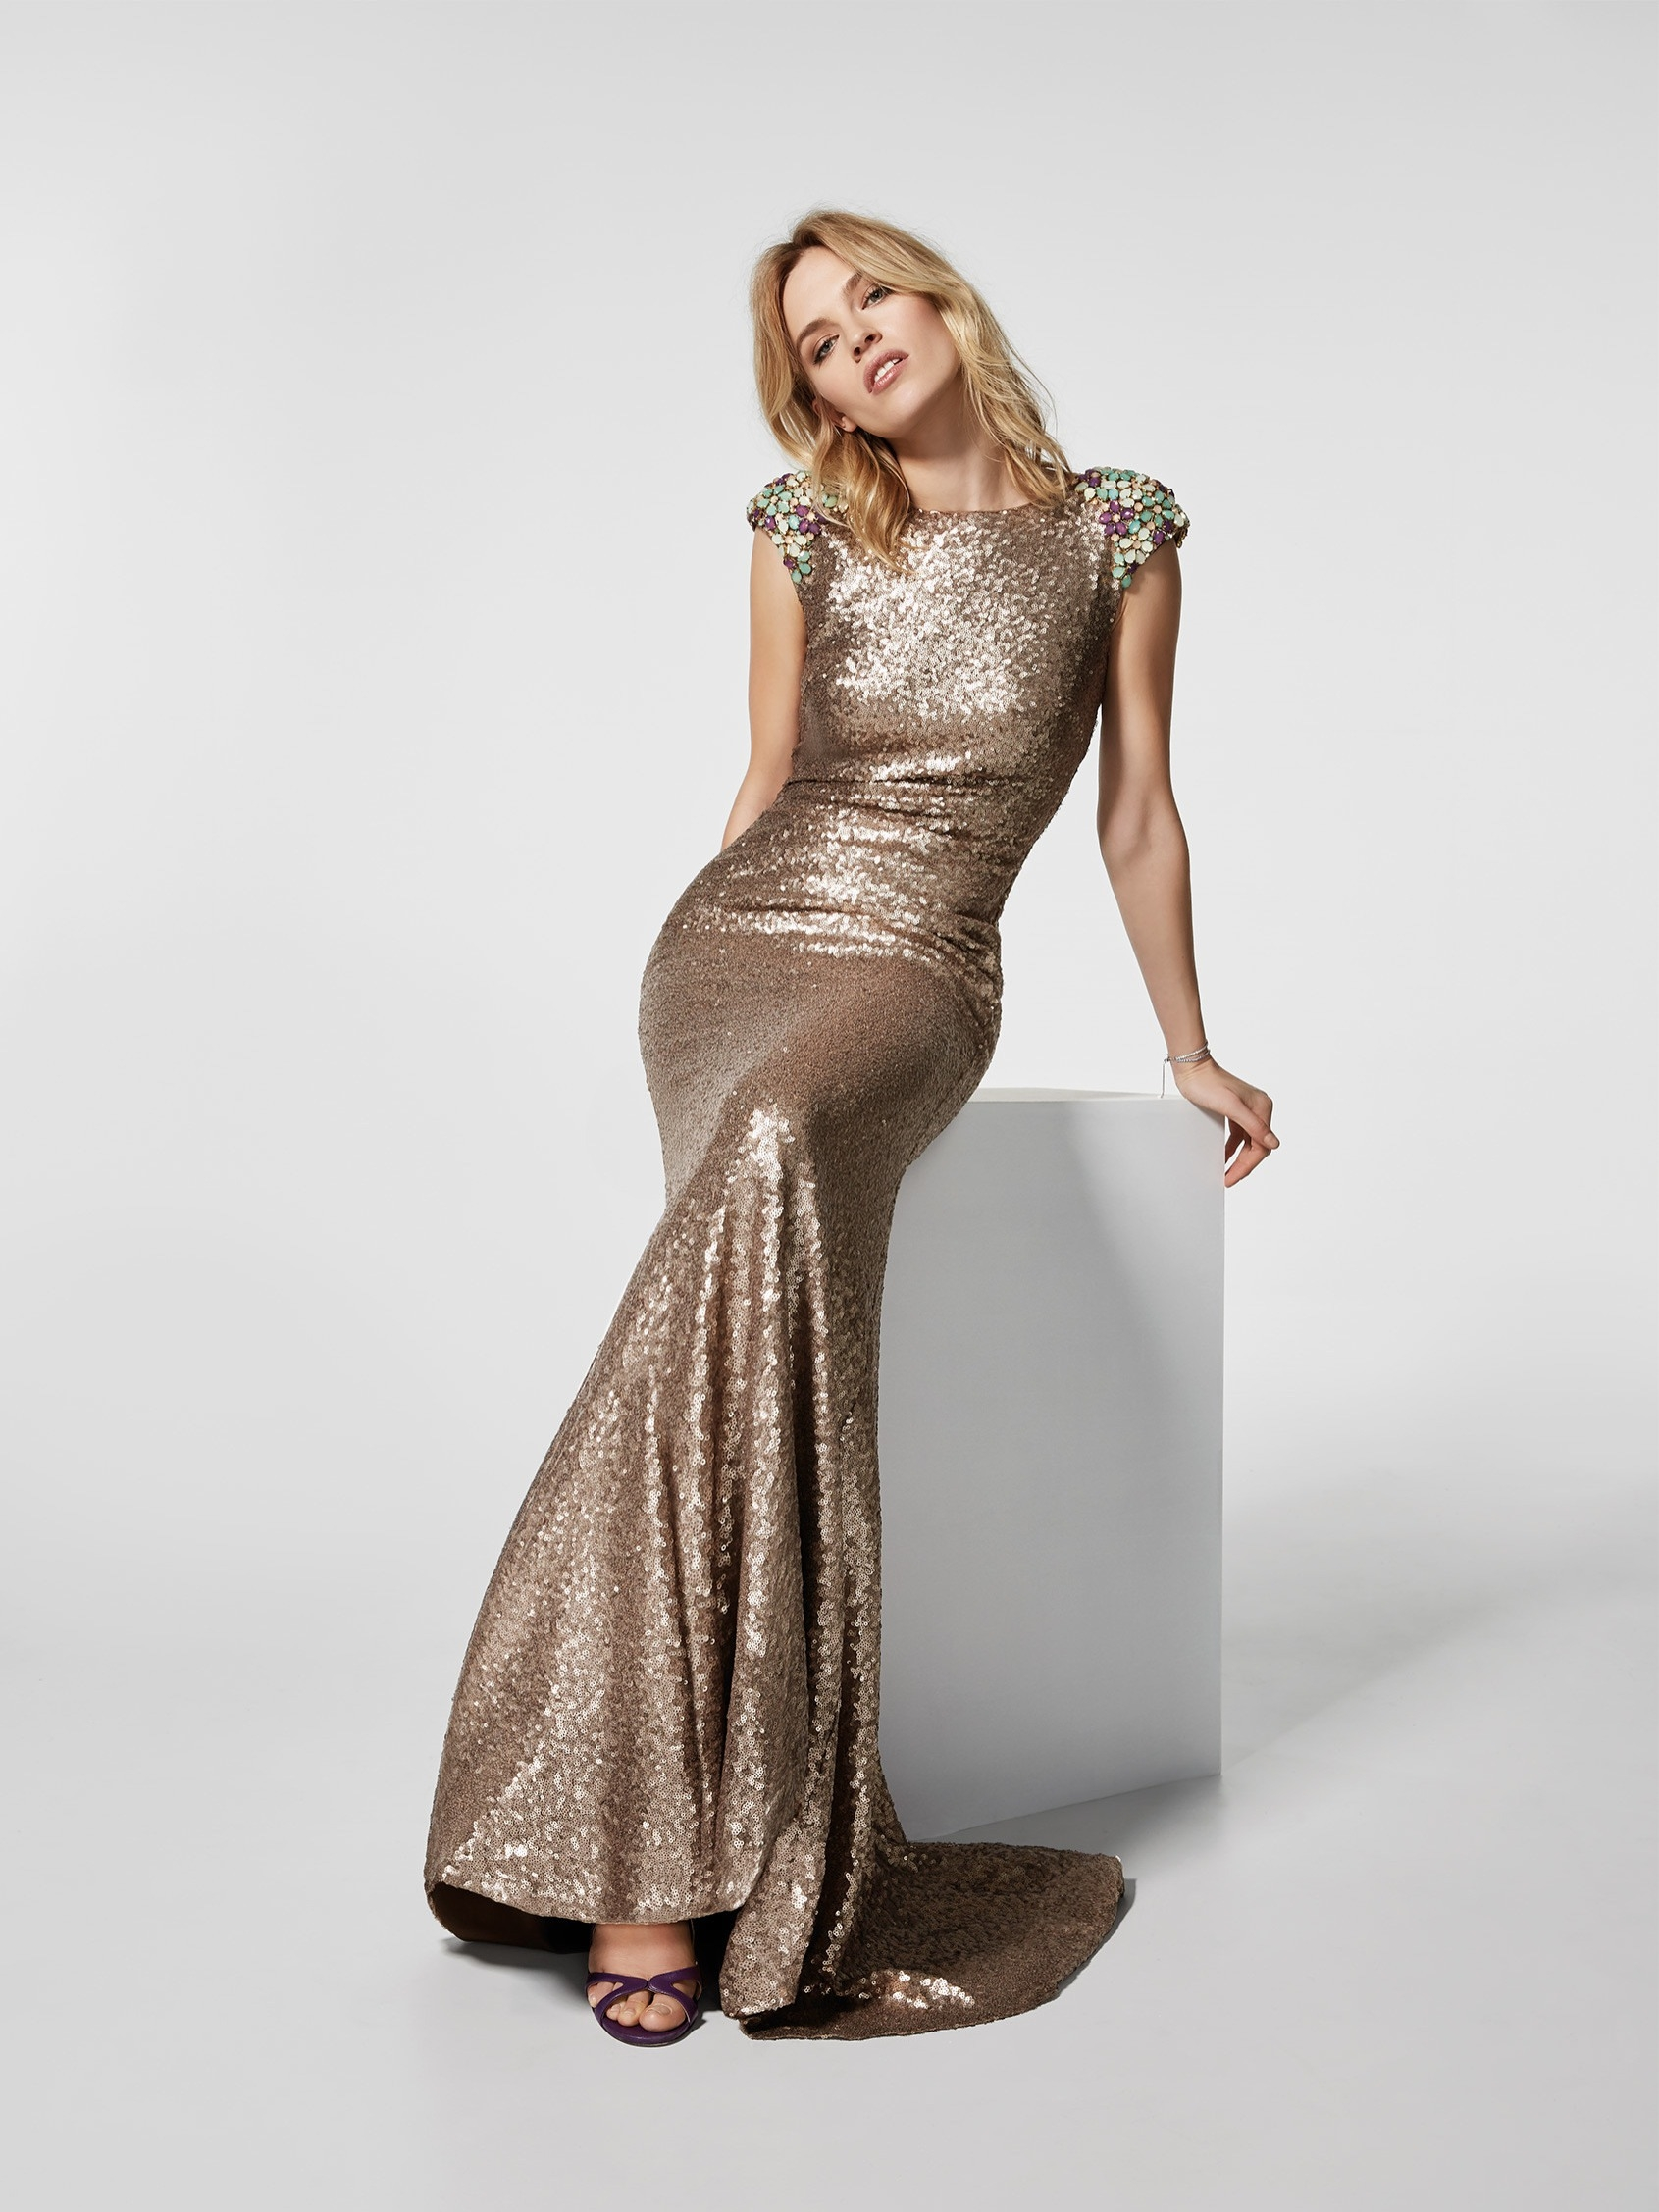 Formal Kreativ Abendkleid Gold Galerie15 Coolste Abendkleid Gold Galerie